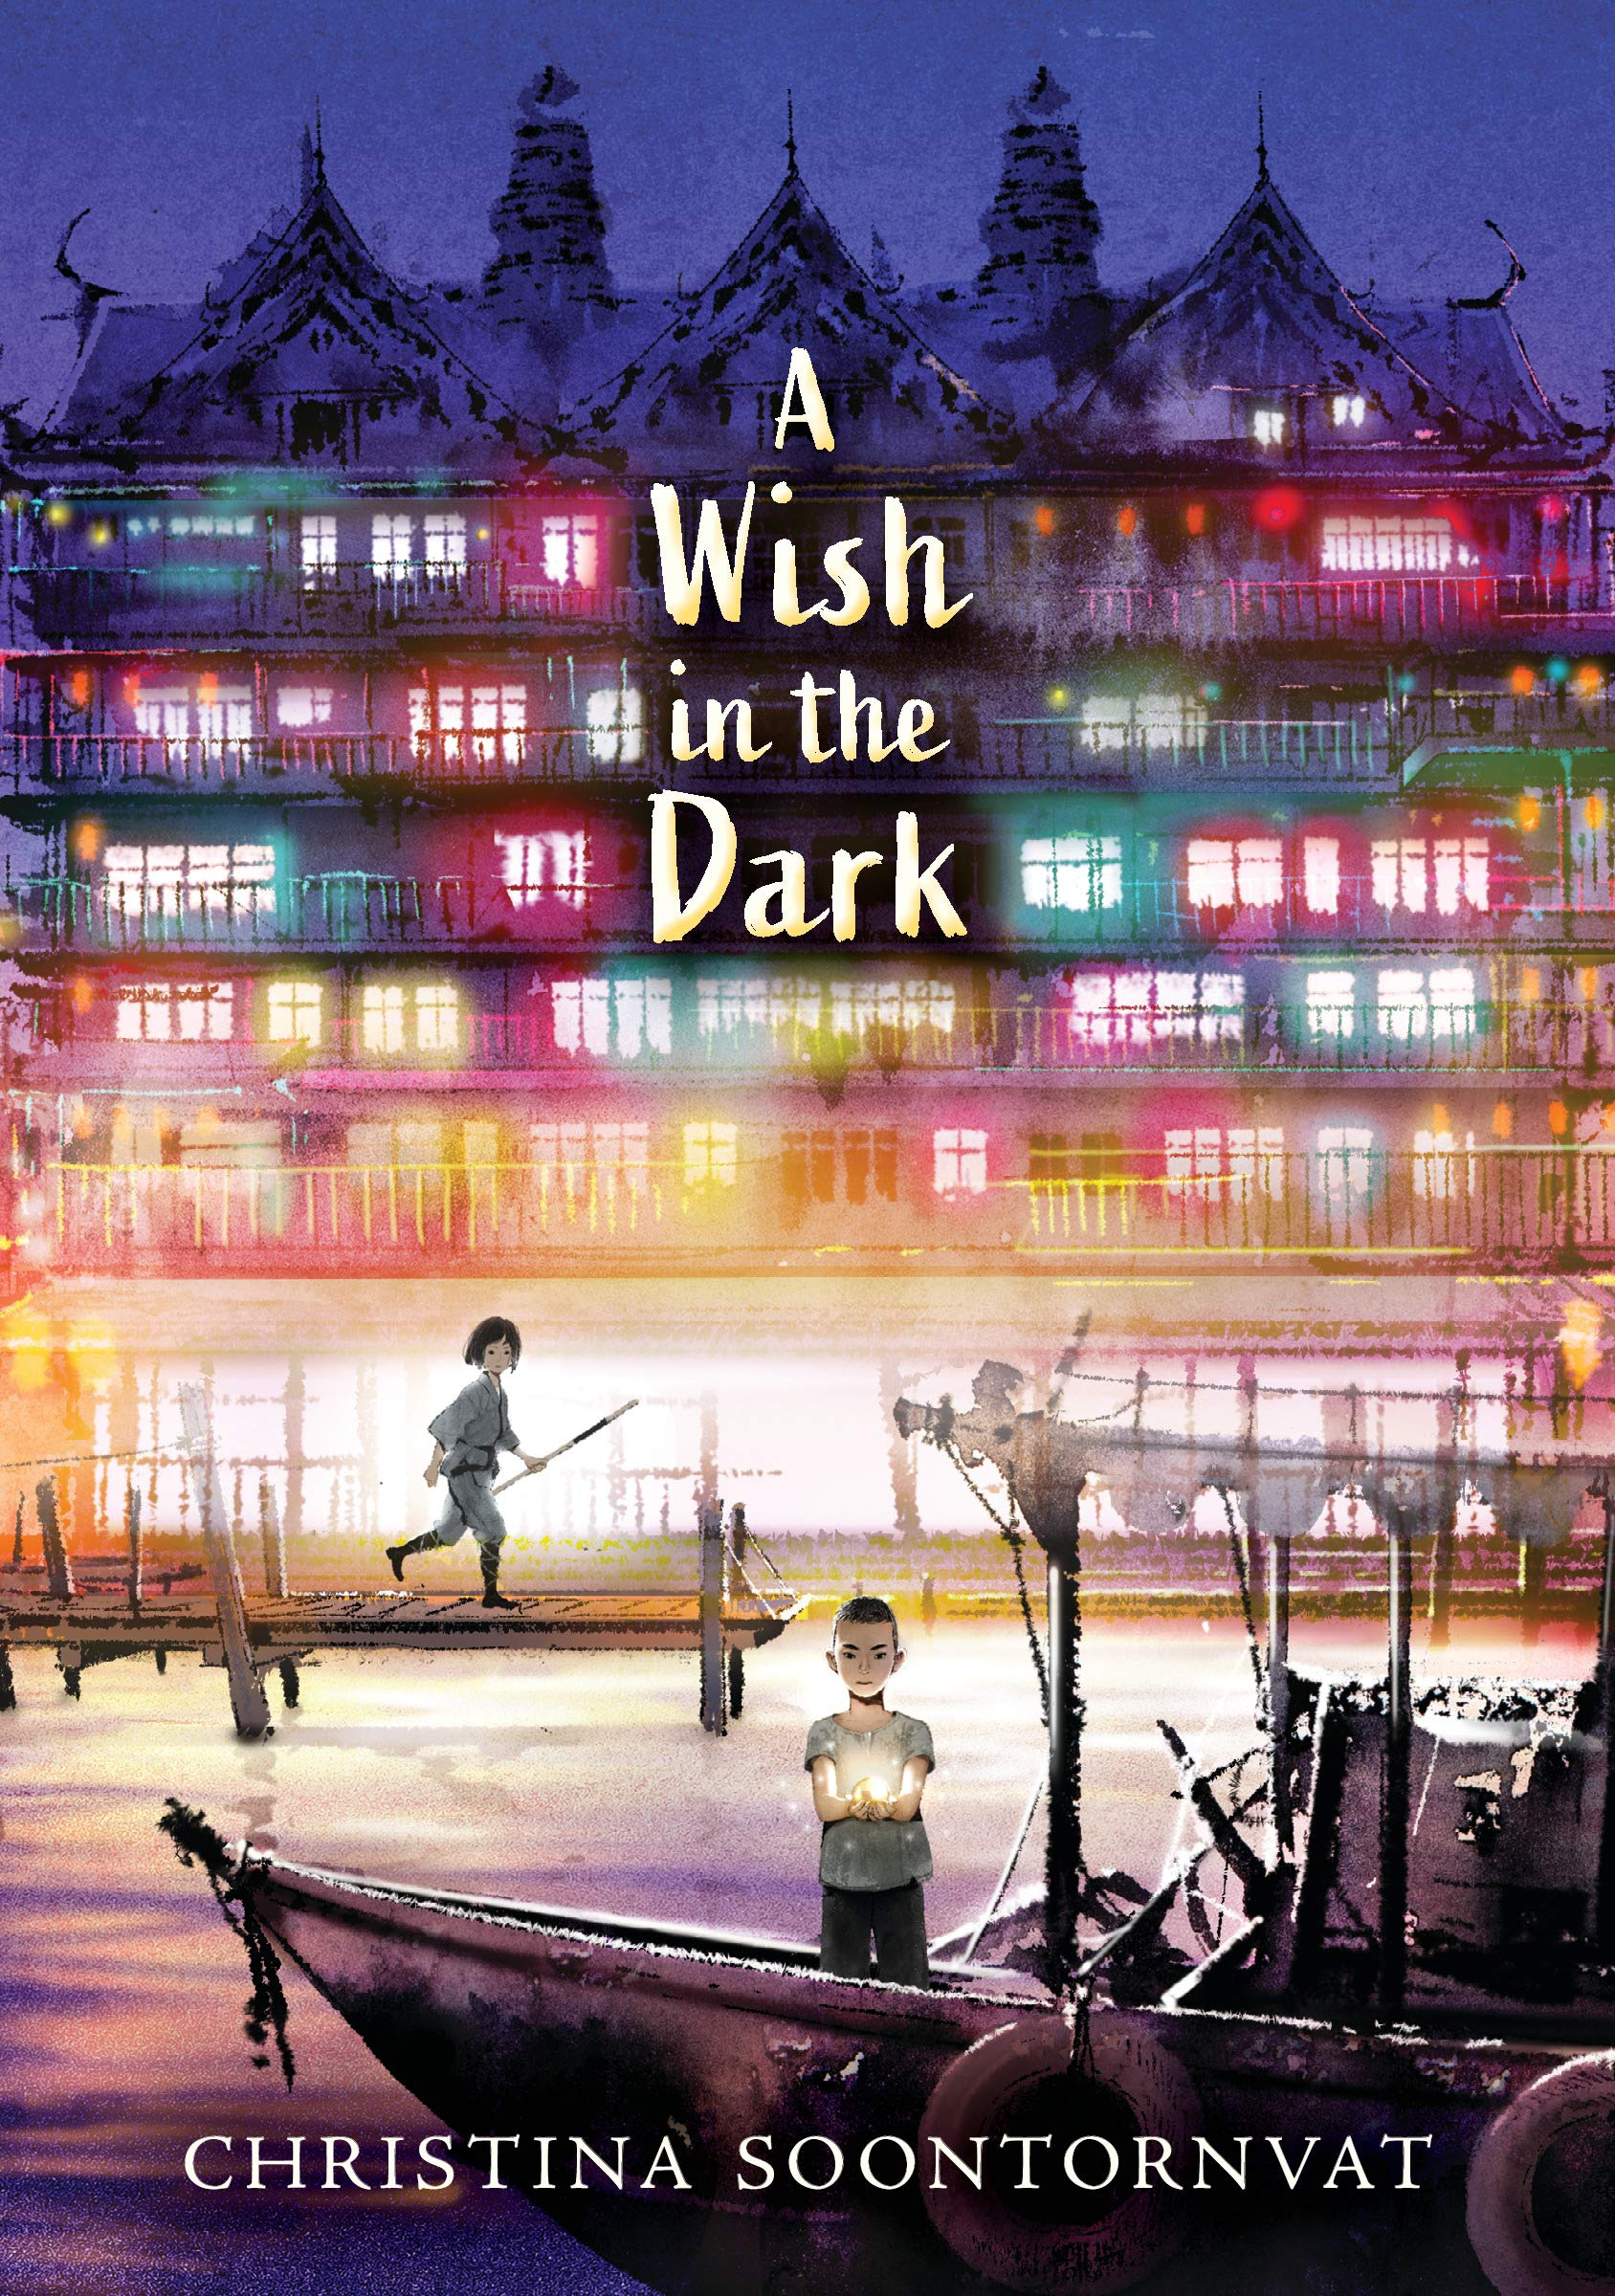 A Wish in the Dark: Soontornvat, Christina: 9781536204940: Amazon.com: Books